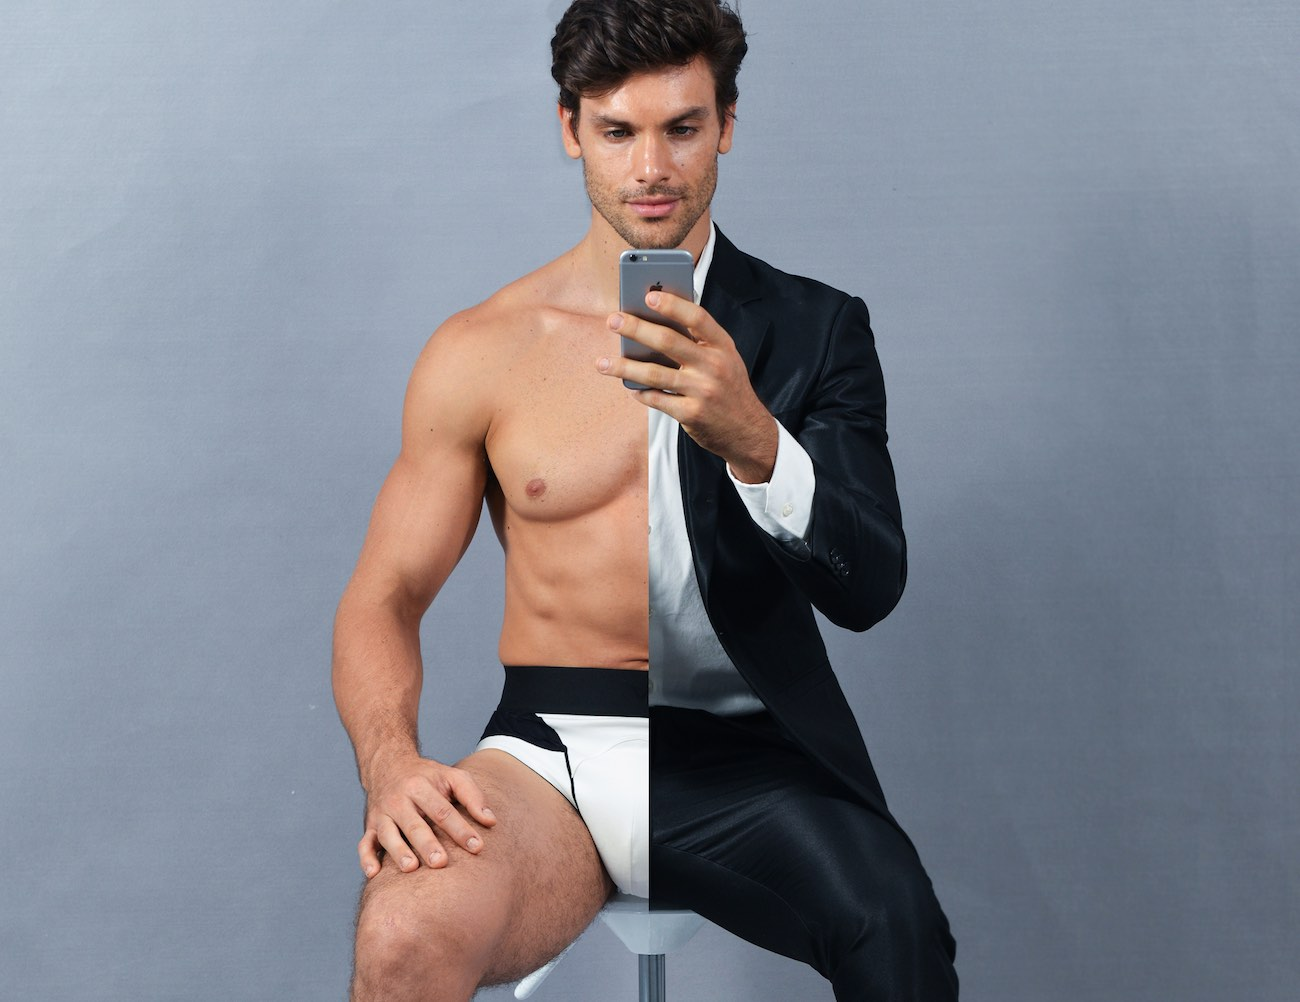 VylyV 2.0 Male Performance Boosting Underwear